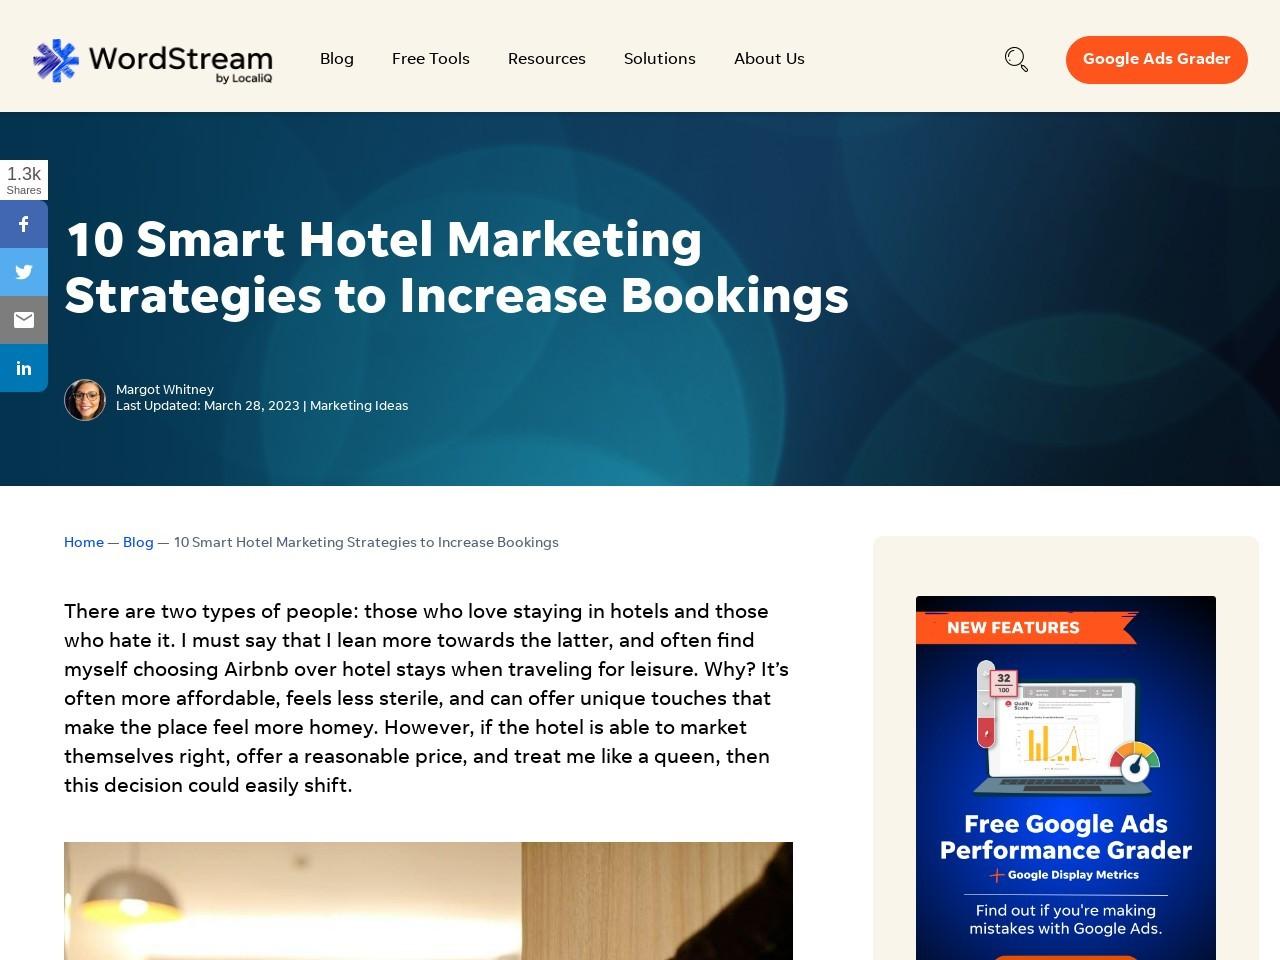 10 Smart Hotel Marketing Strategies to Increase Bookings